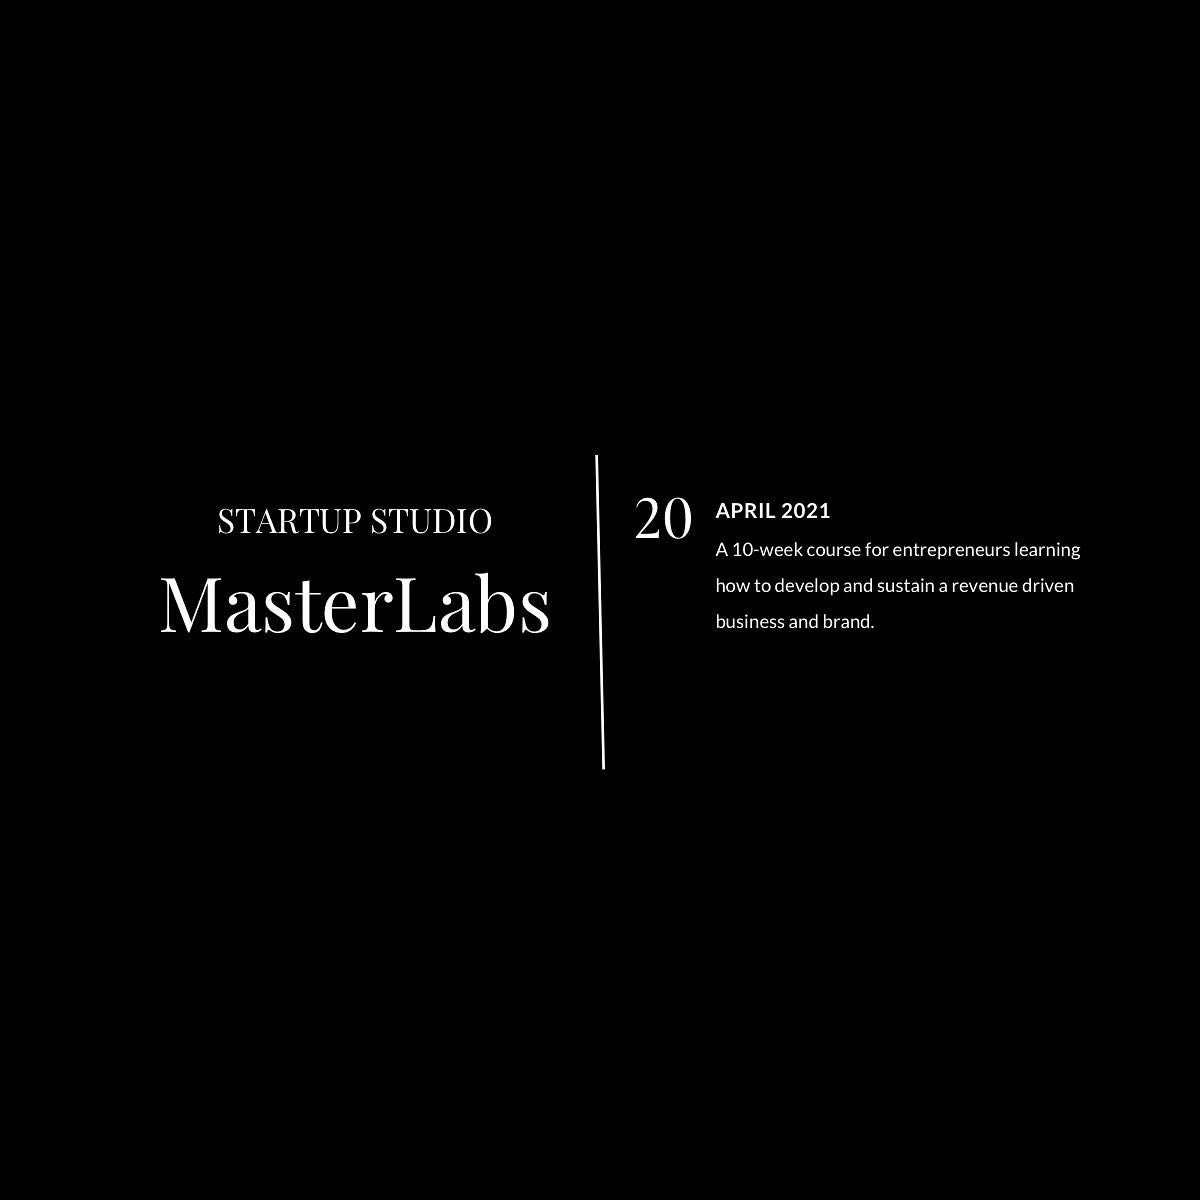 Startup Studio MasterLabs